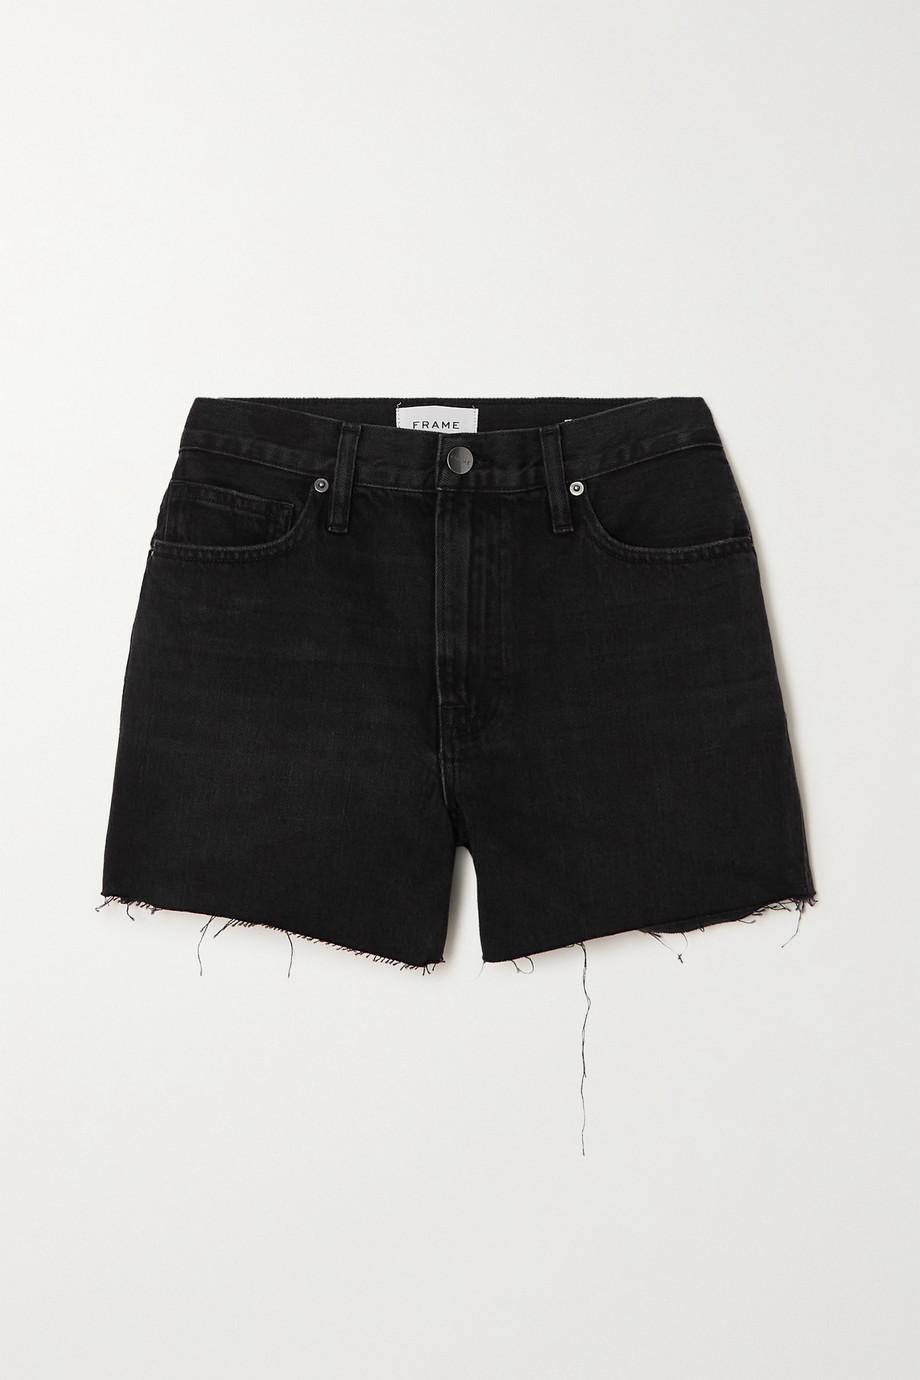 FRAME Le Simone distressed denim shorts